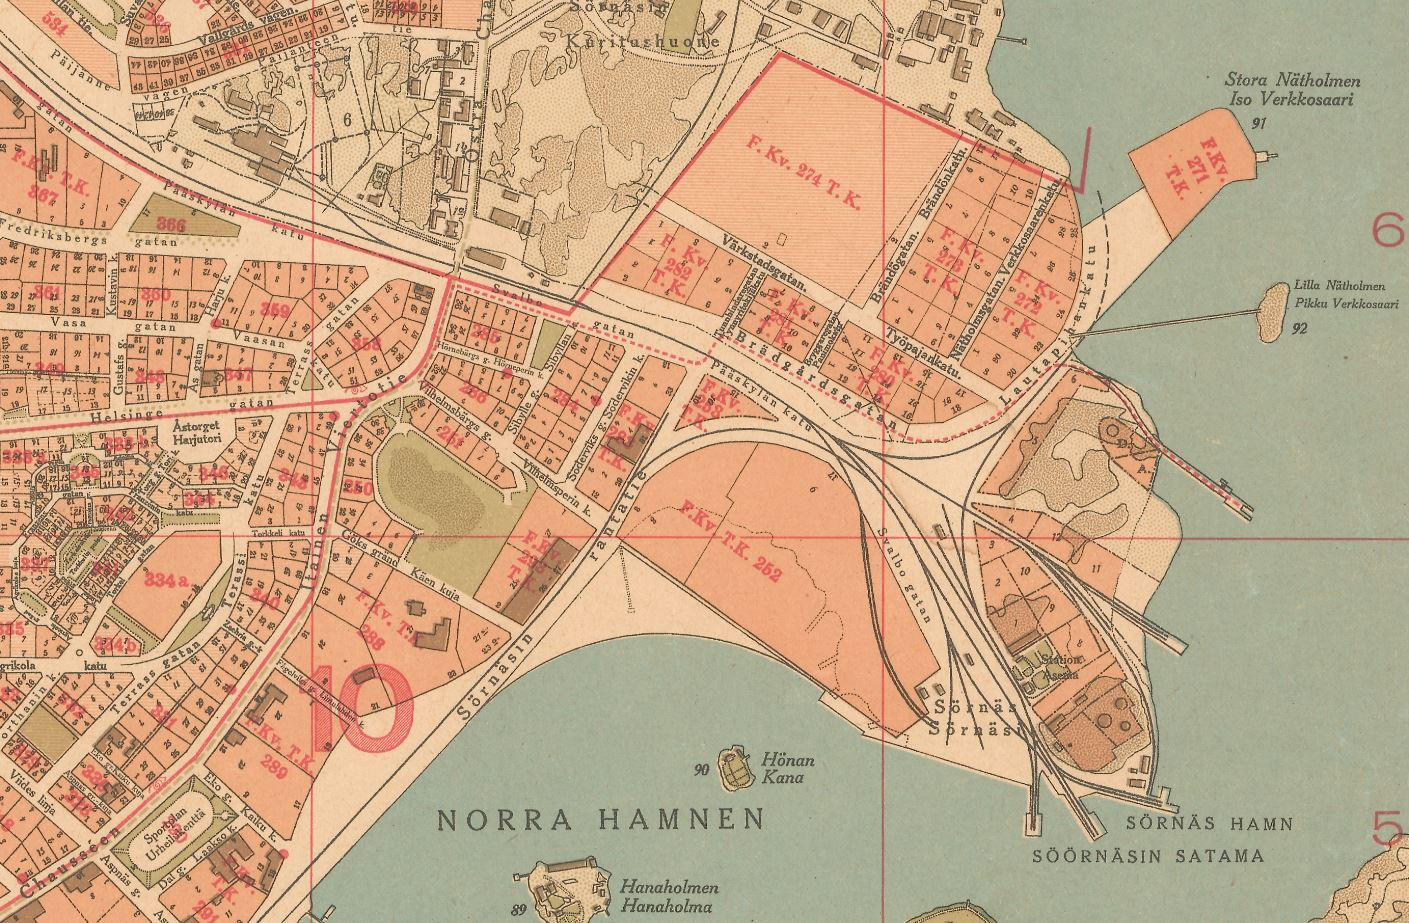 2018-12-03-131647.004143Kuvakaappaus1917-1918HelsinkiHelsinginKaupunginarkisto.JPG